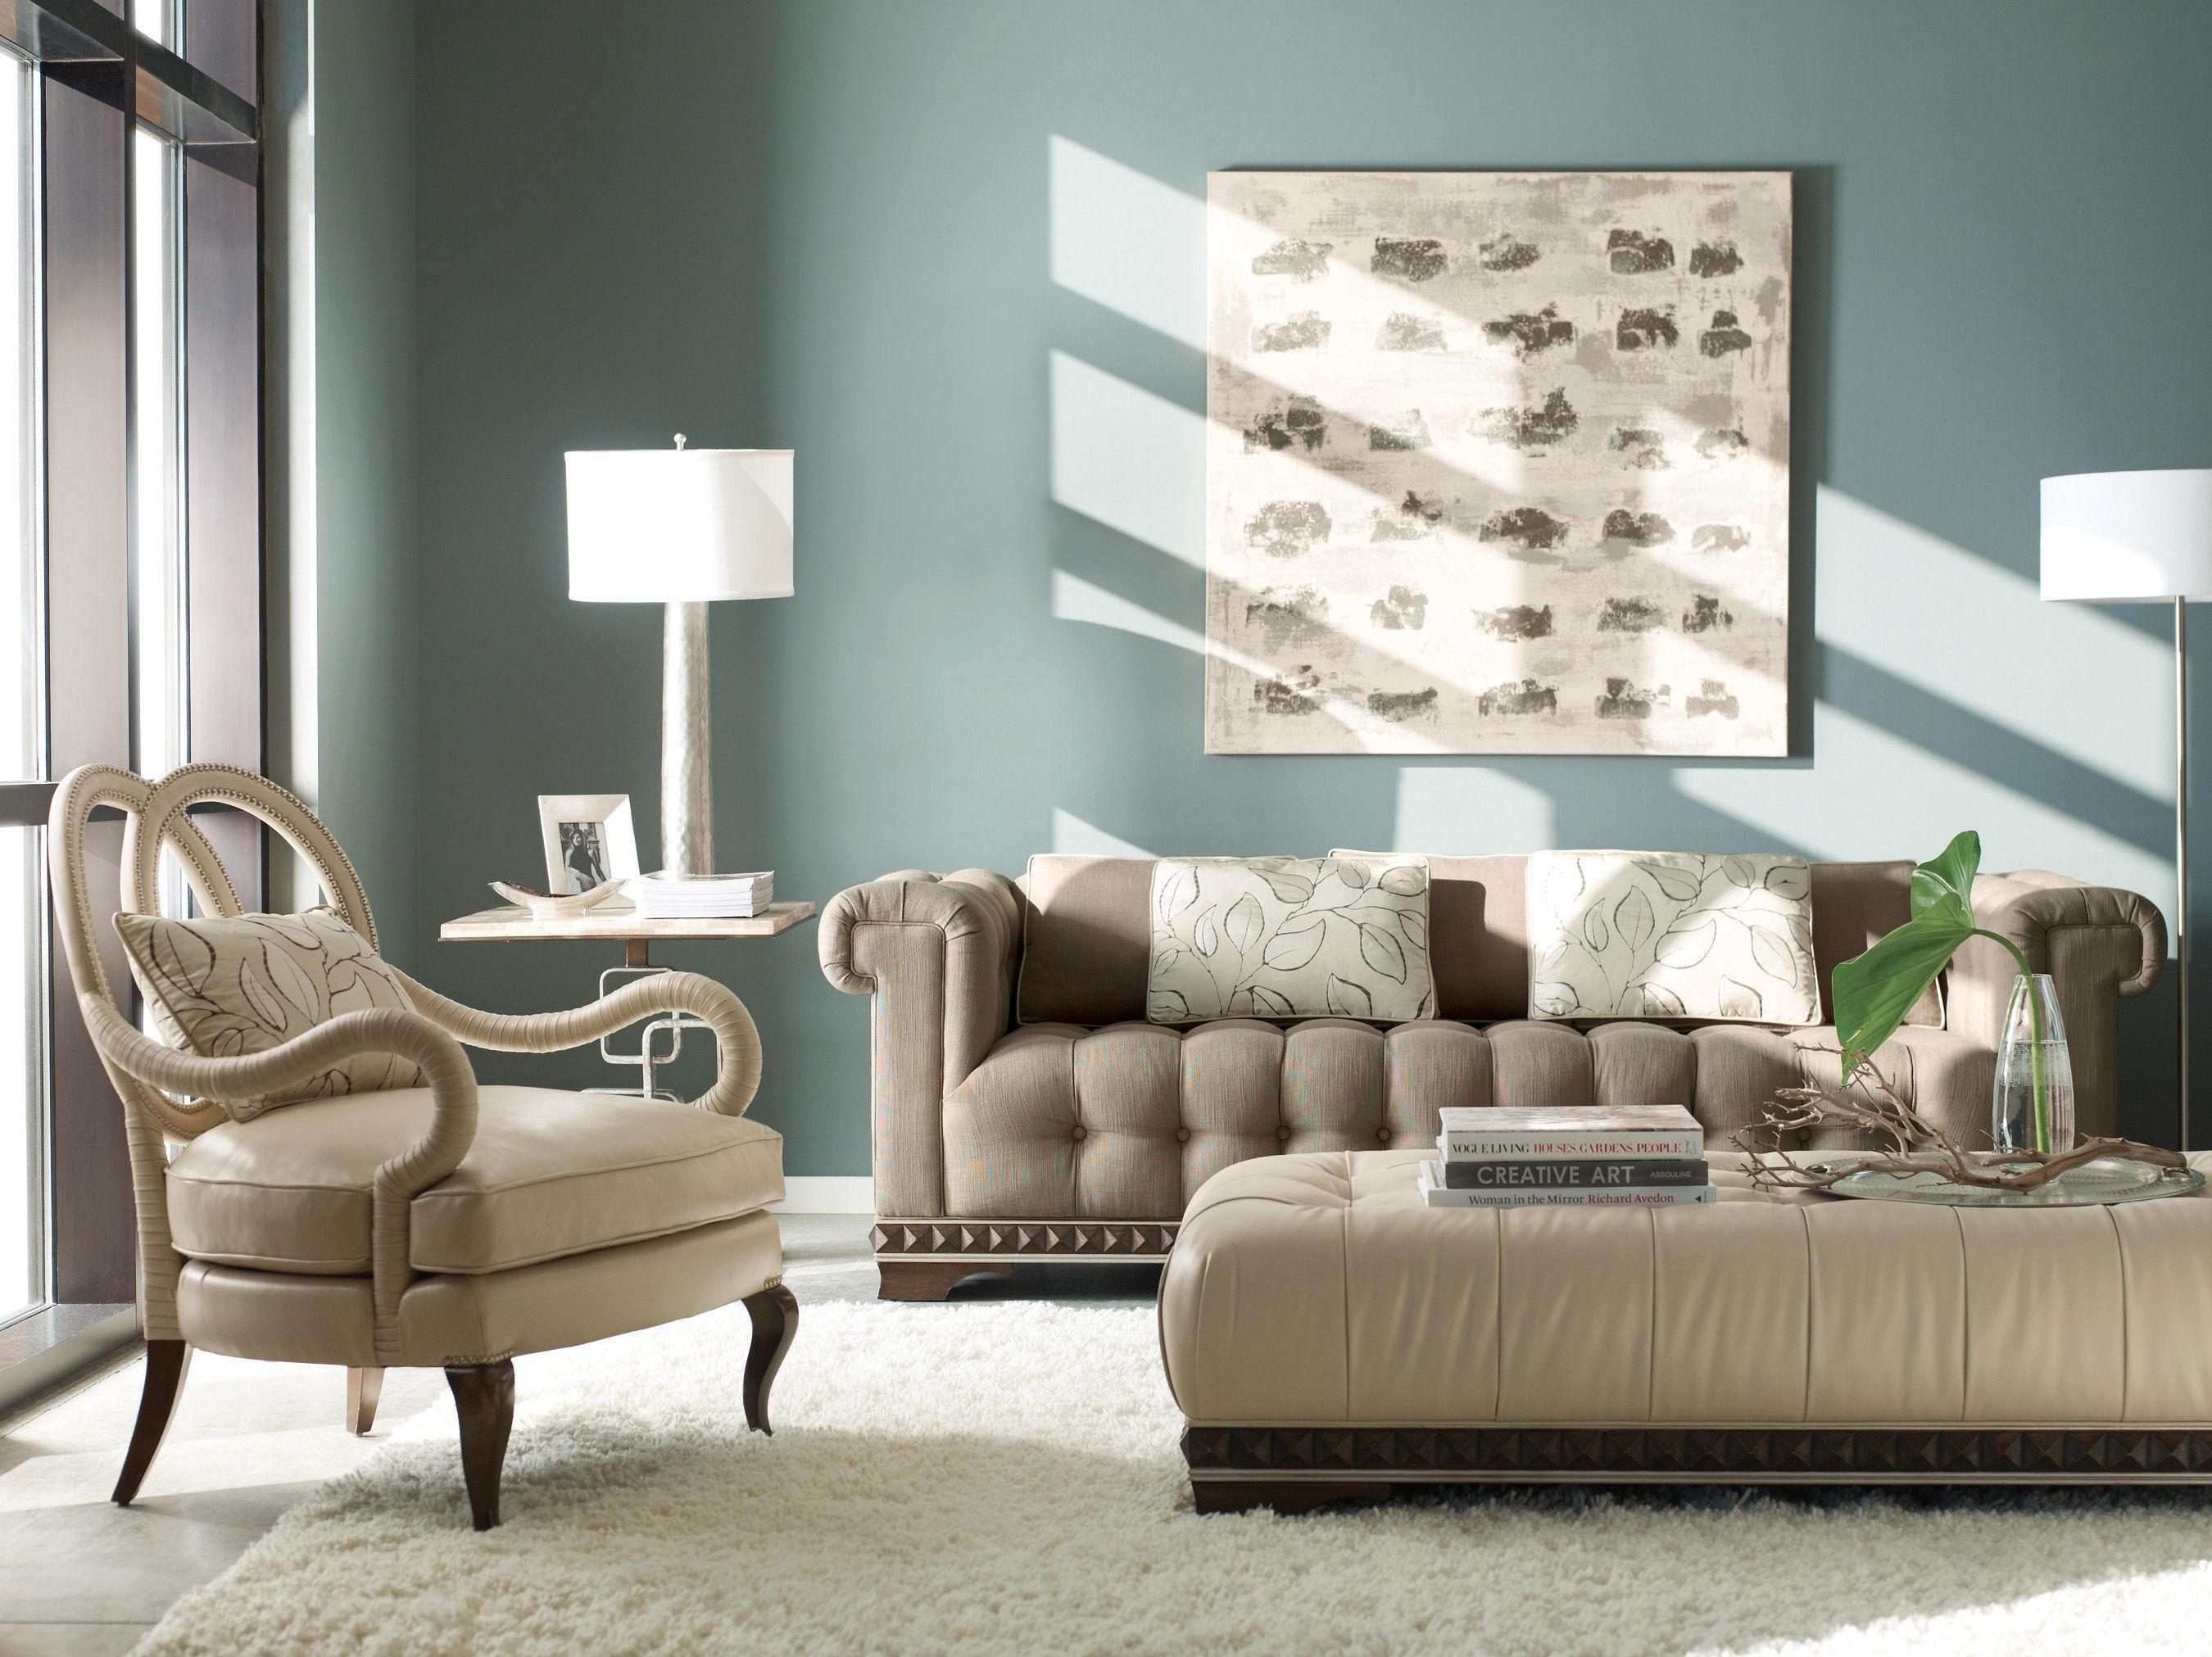 Camel Leather Sofa Decorating Ideas | Tehranmix Decoration Regarding Camel Color Sofas (View 19 of 20)